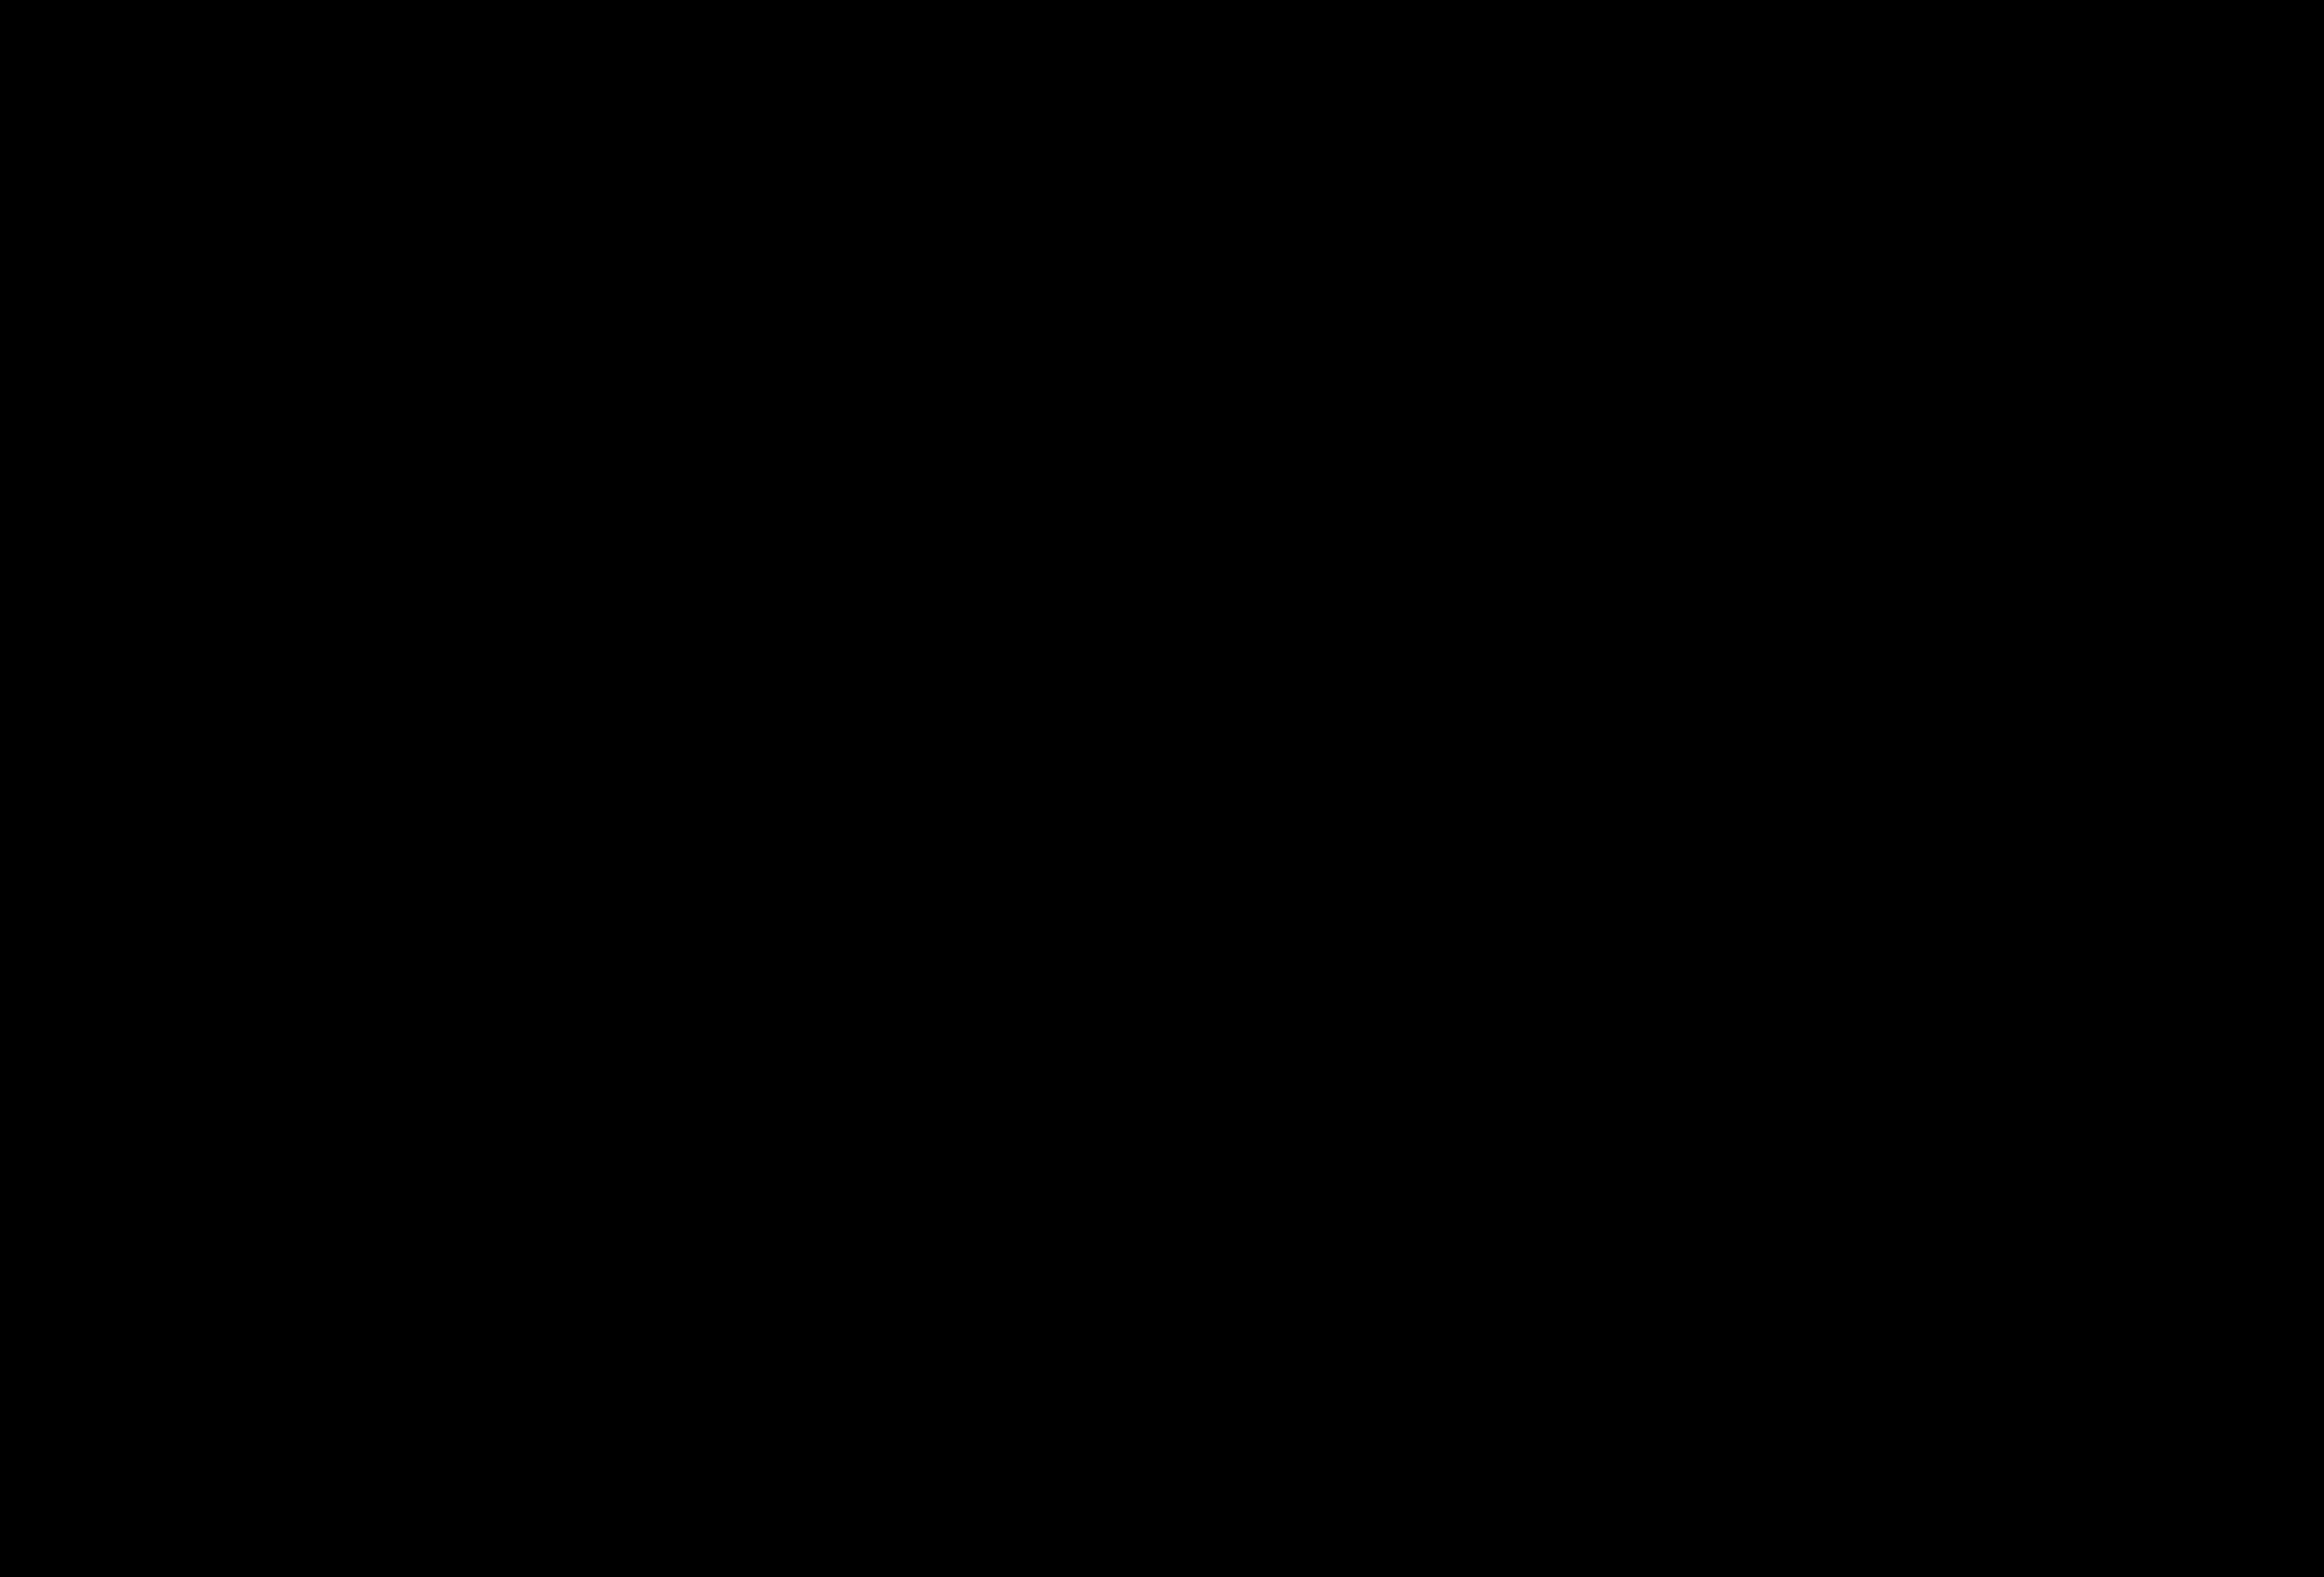 agent-real-estate-schools-black-logo